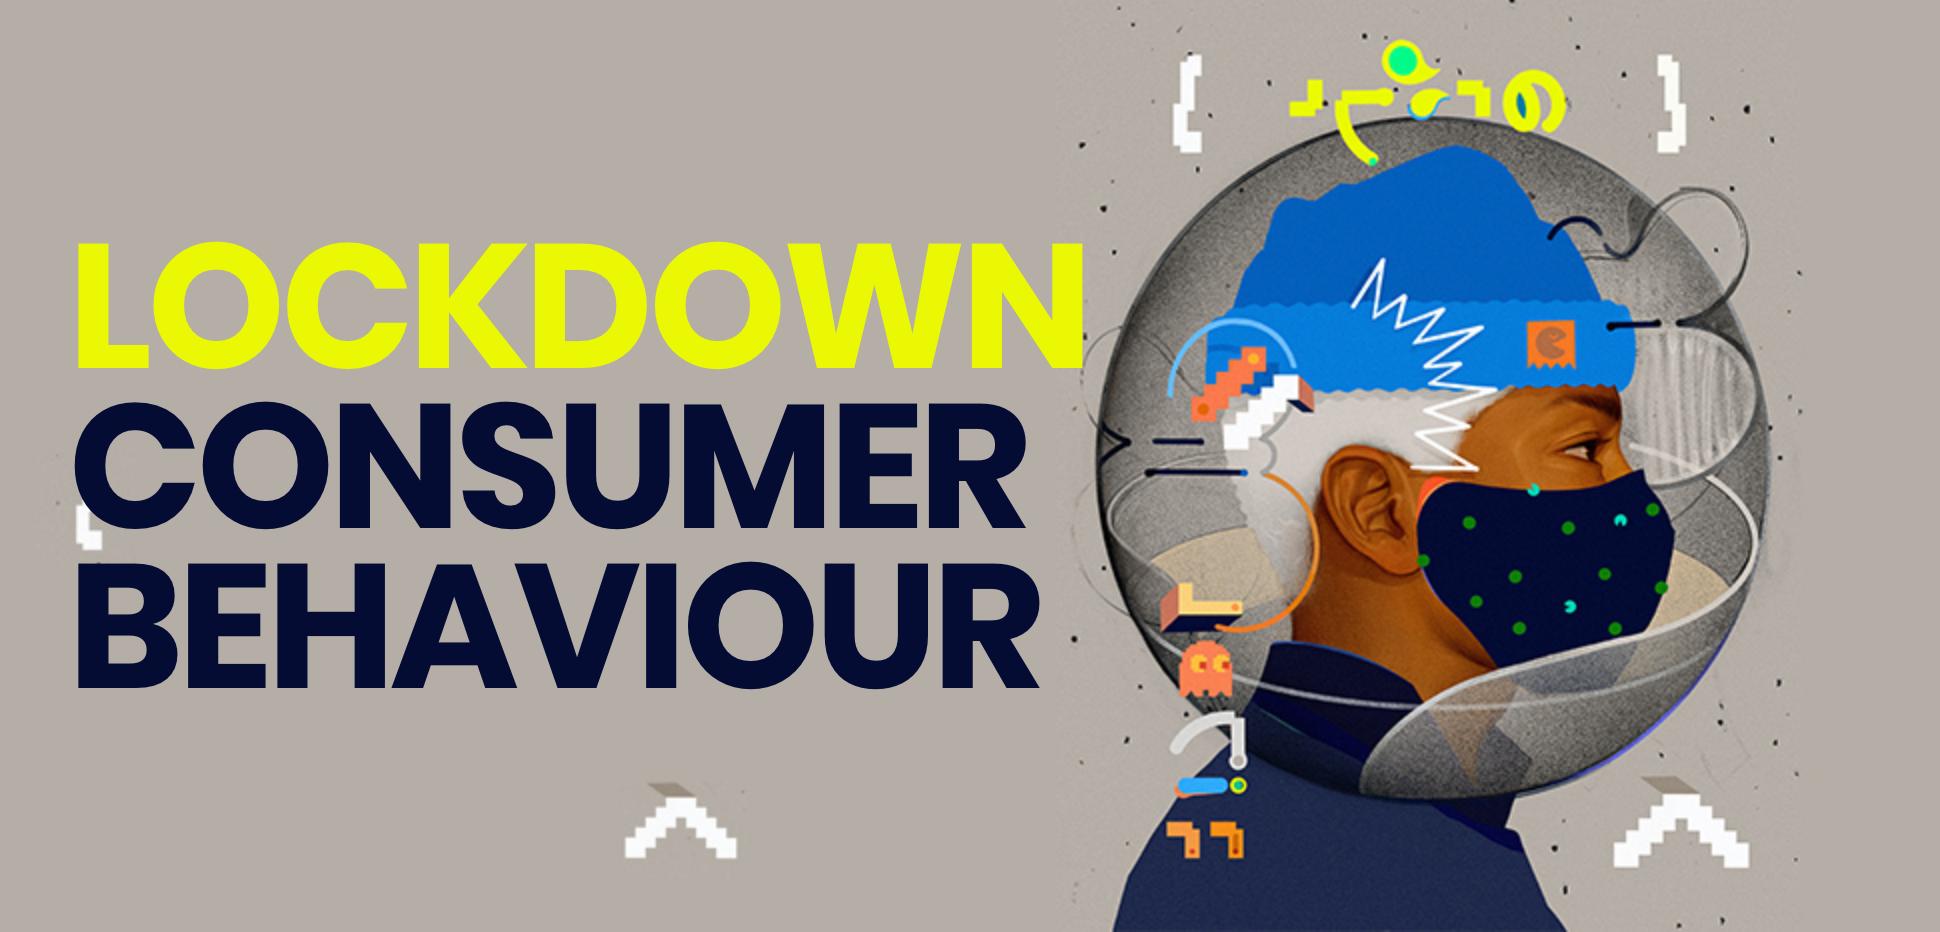 Lockdown consumer behaviour